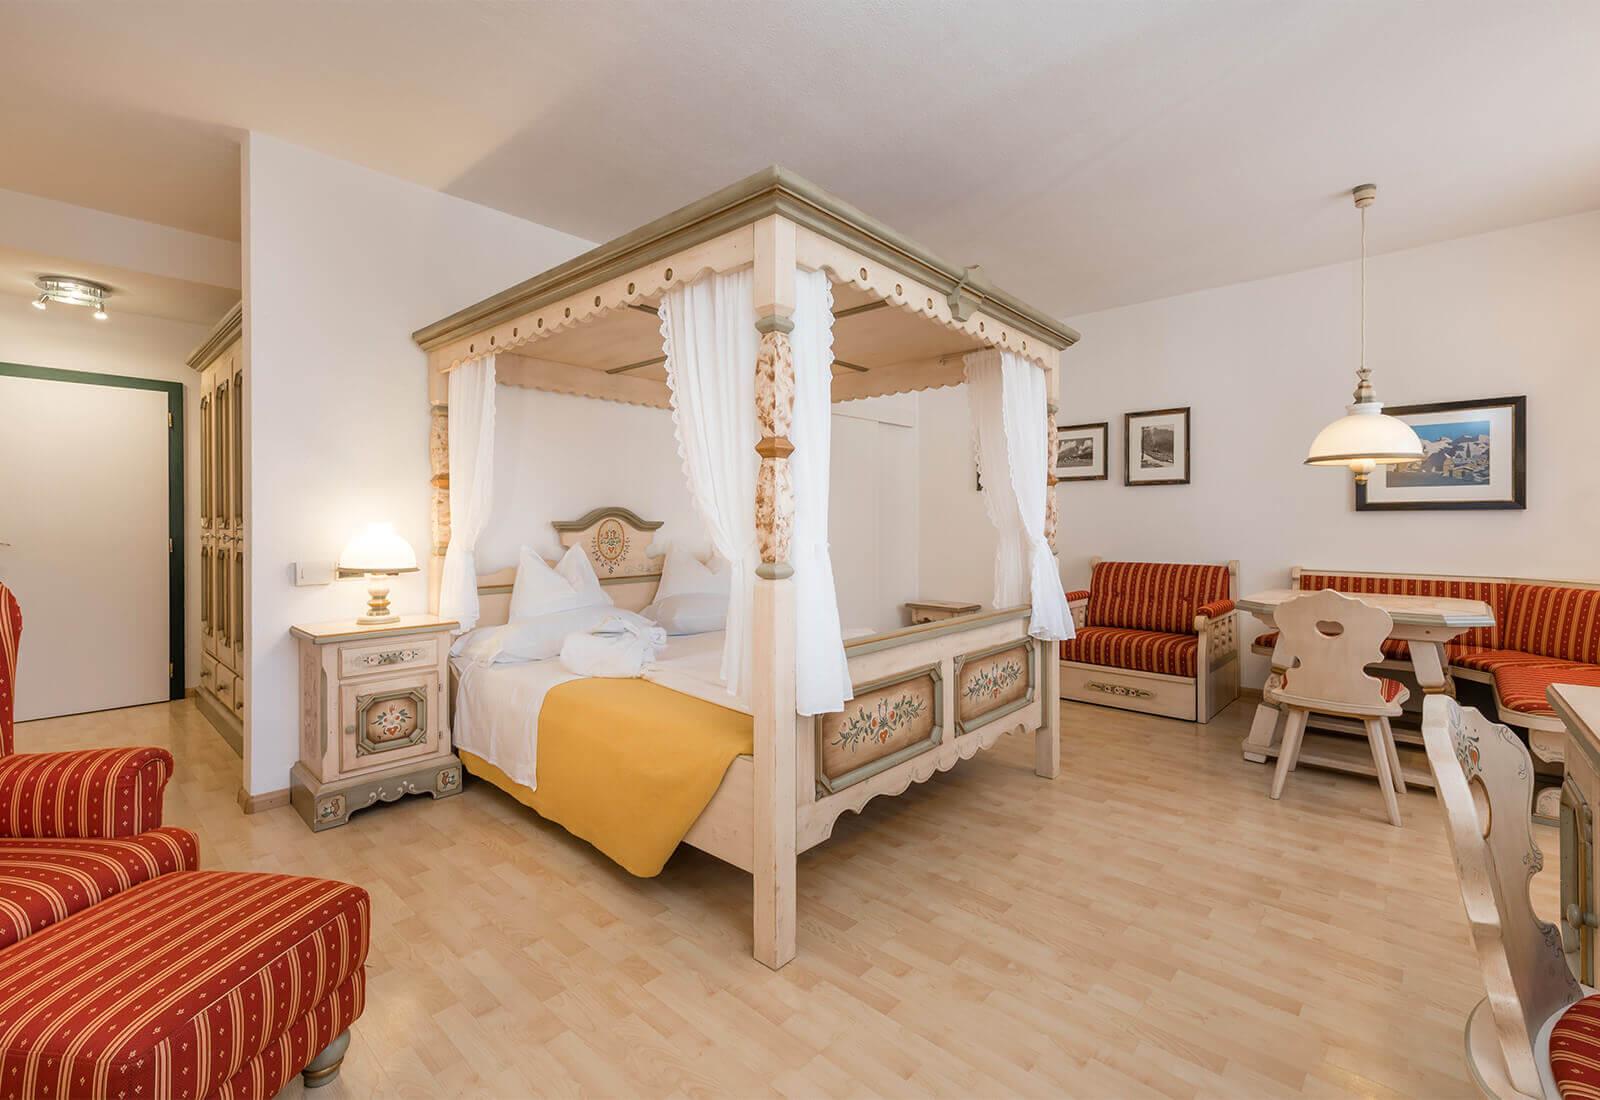 Family Hotel 4 Stelle S a San Candido - Cavallino Bianco